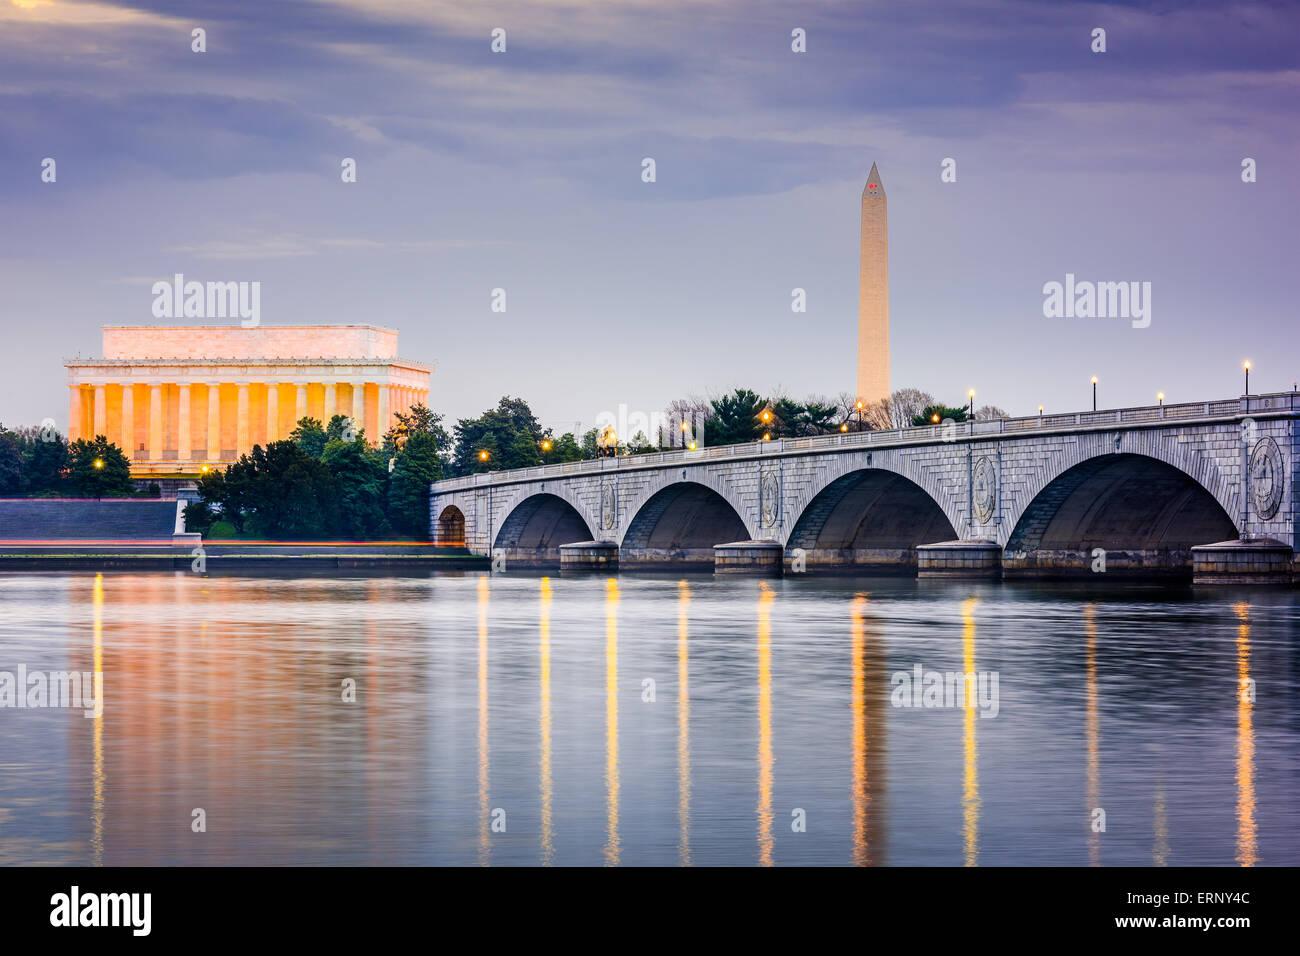 Washington DC, USA skyilne on the Potomac River with Lincoln Memorial, Washington Memorial, and Arlington Memorial - Stock Image